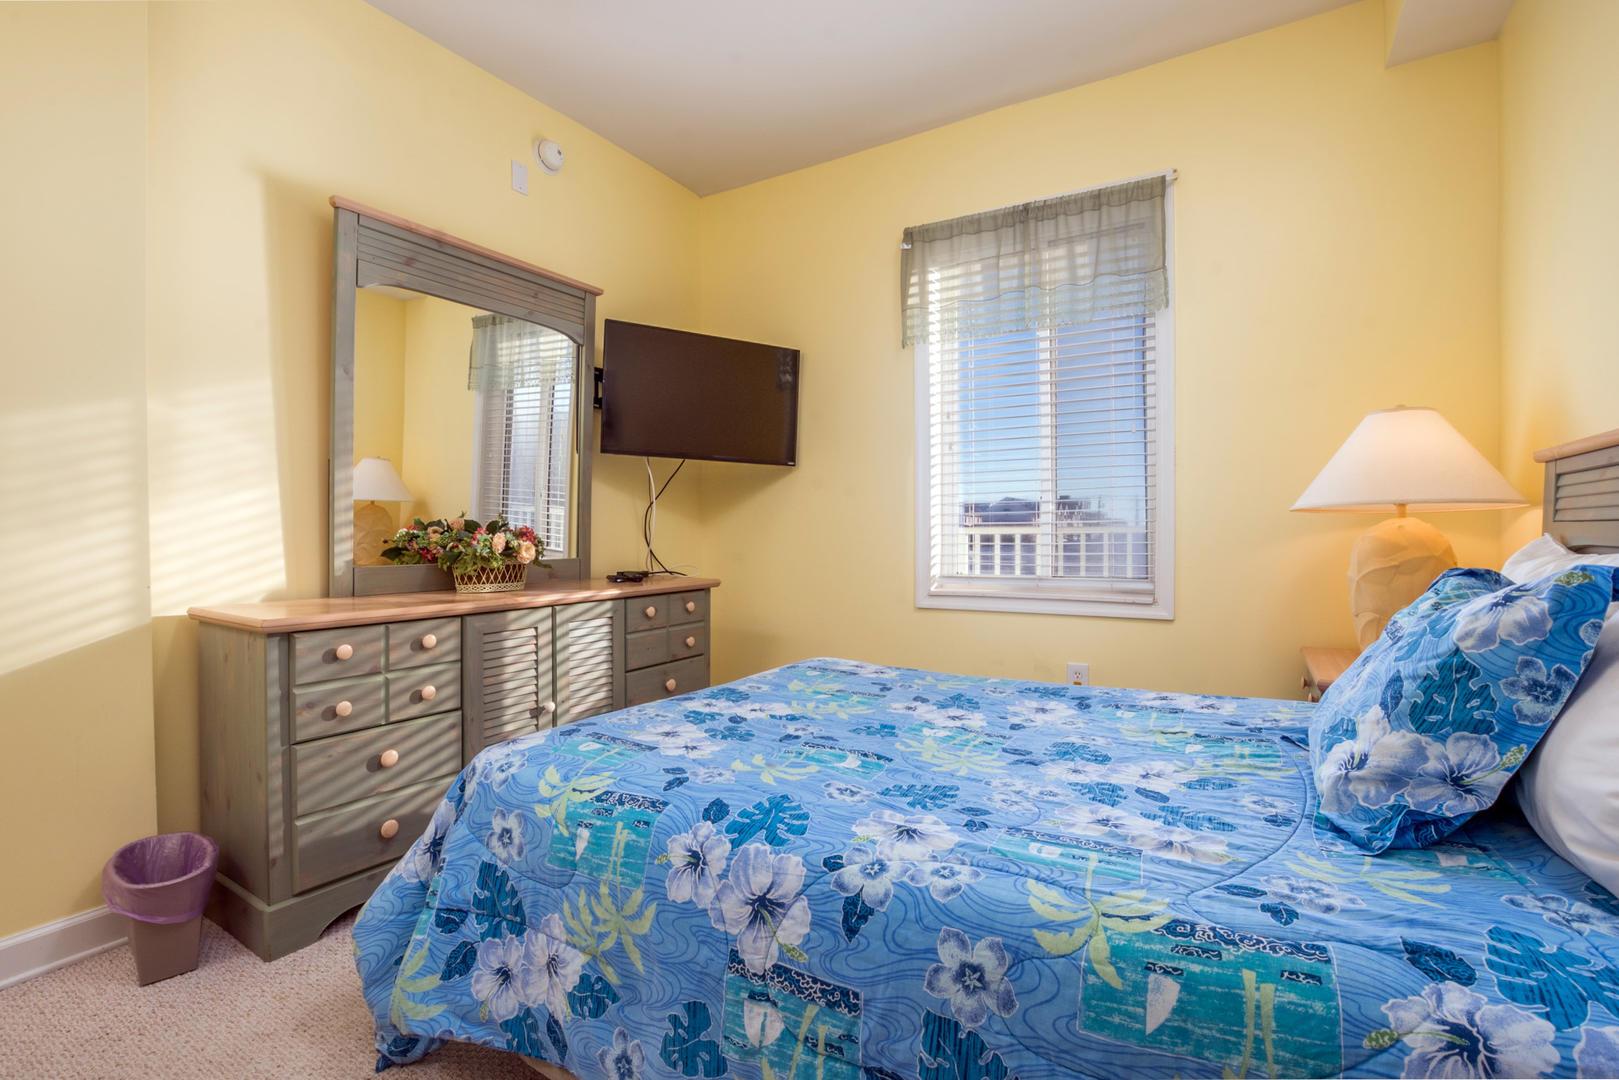 Maresol 309 - Bedroom 2